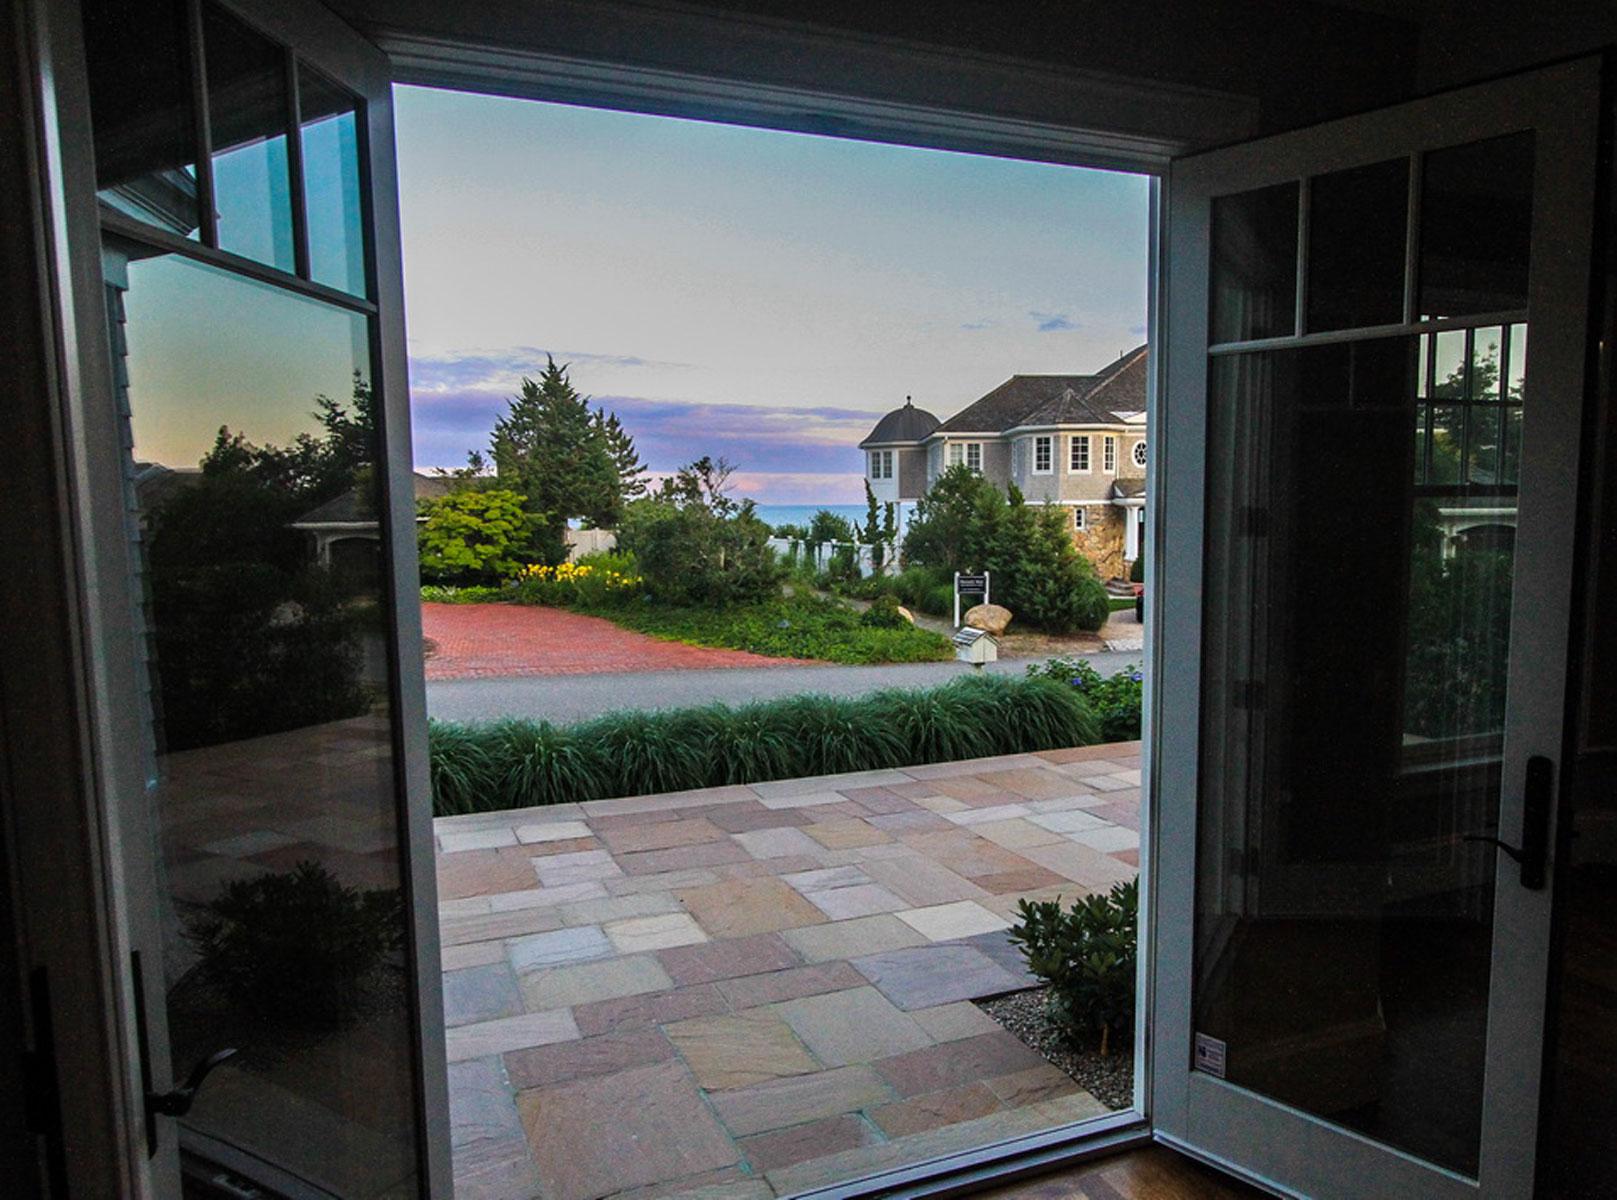 Single Family Home for Sale at TRITON SOUND SOPHISTICATED DESIGN 63 Triton Way New Seabury, Massachusetts 02649 United StatesIn/Around: New Seabury